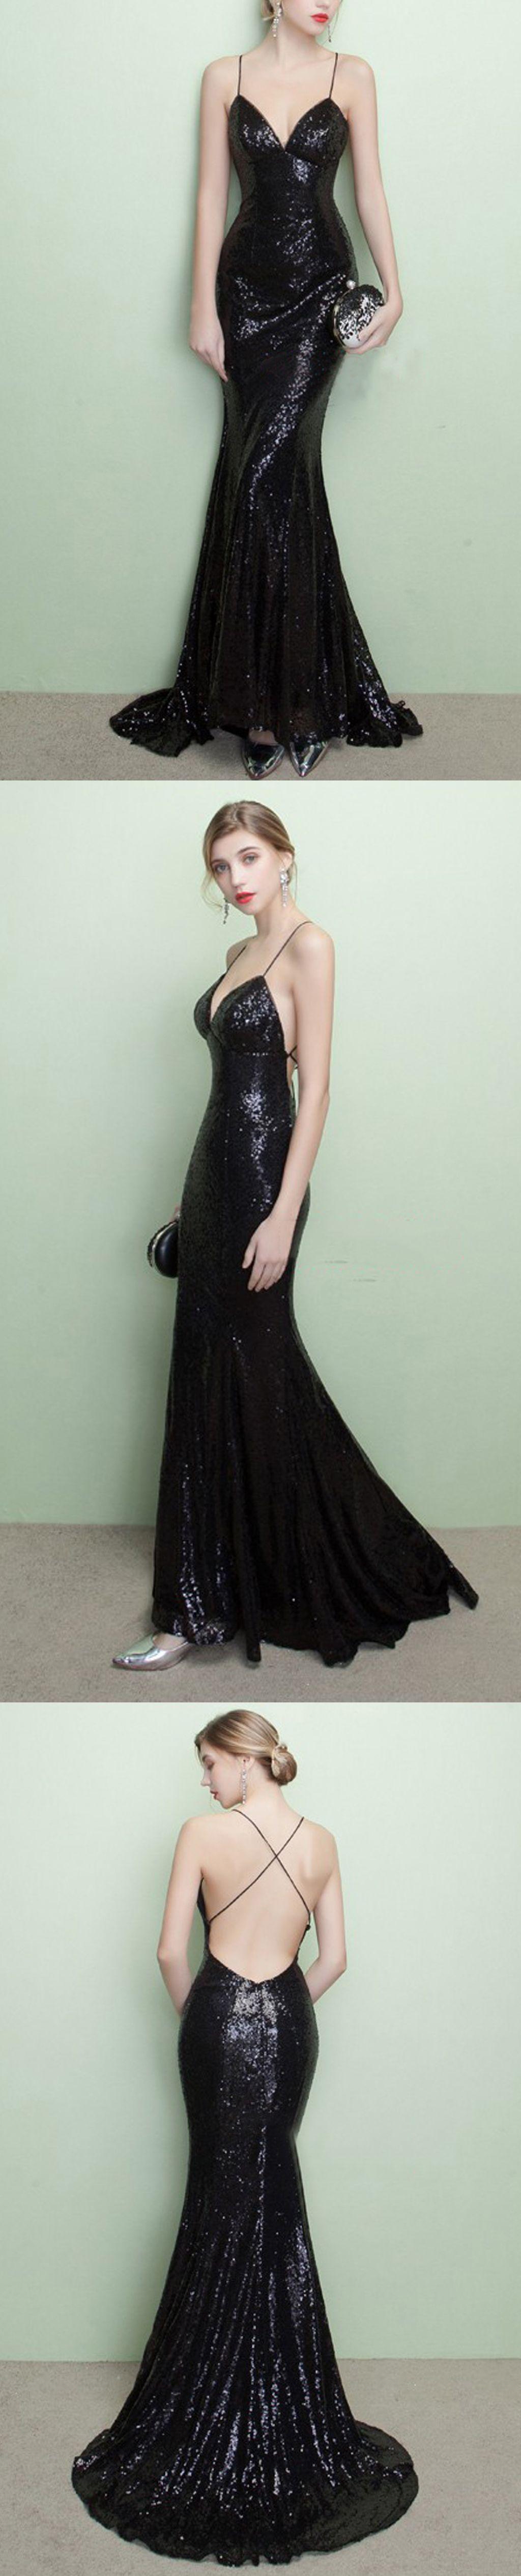 Sparkly black sequins prom dresslace up back prom dressspaghetti